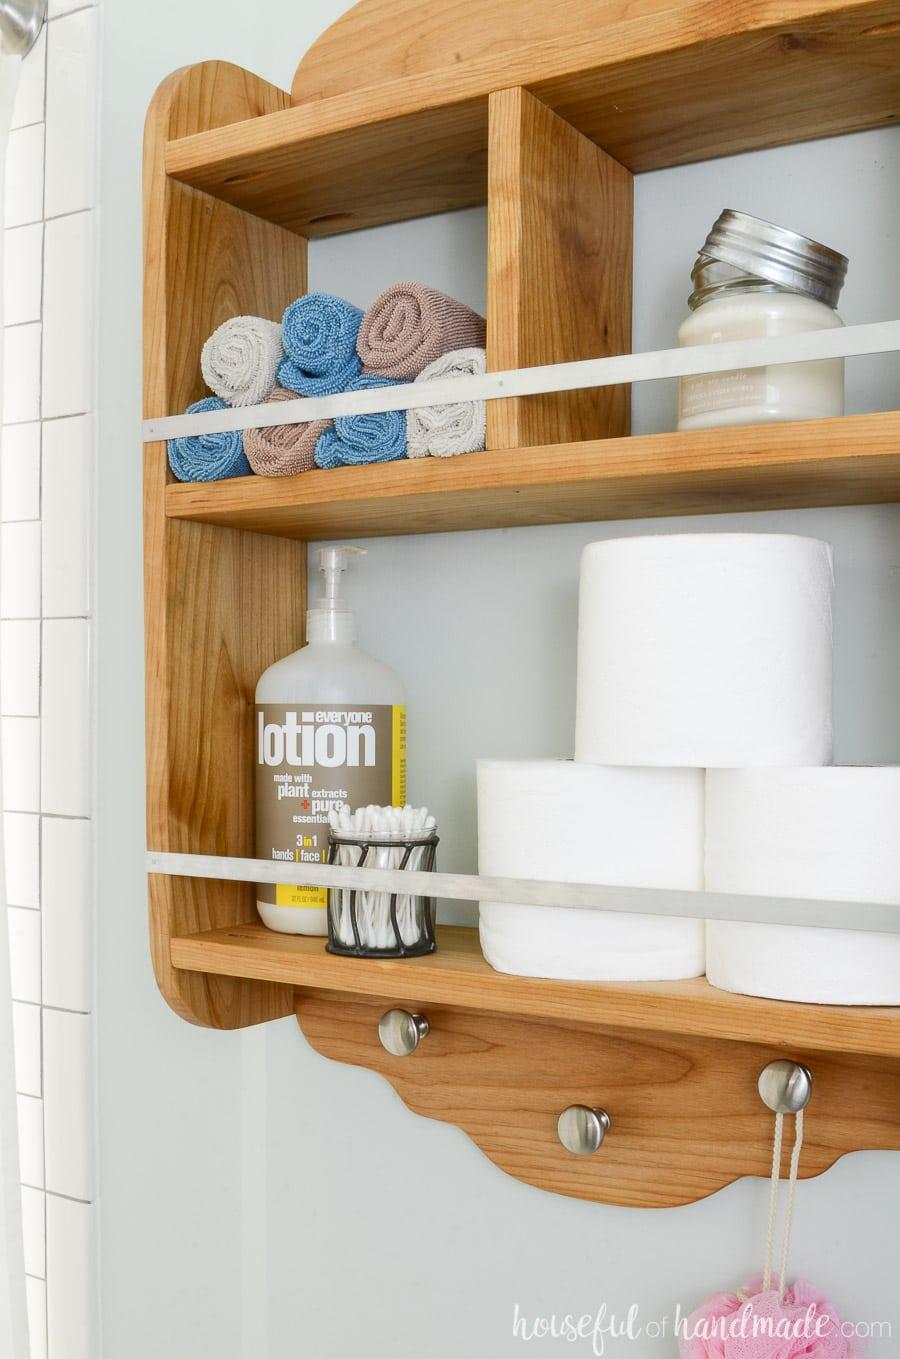 Farmhouse Storage Shelf In The Bathroom Is Perfect For Adding Storage To A  Small Bathroom.